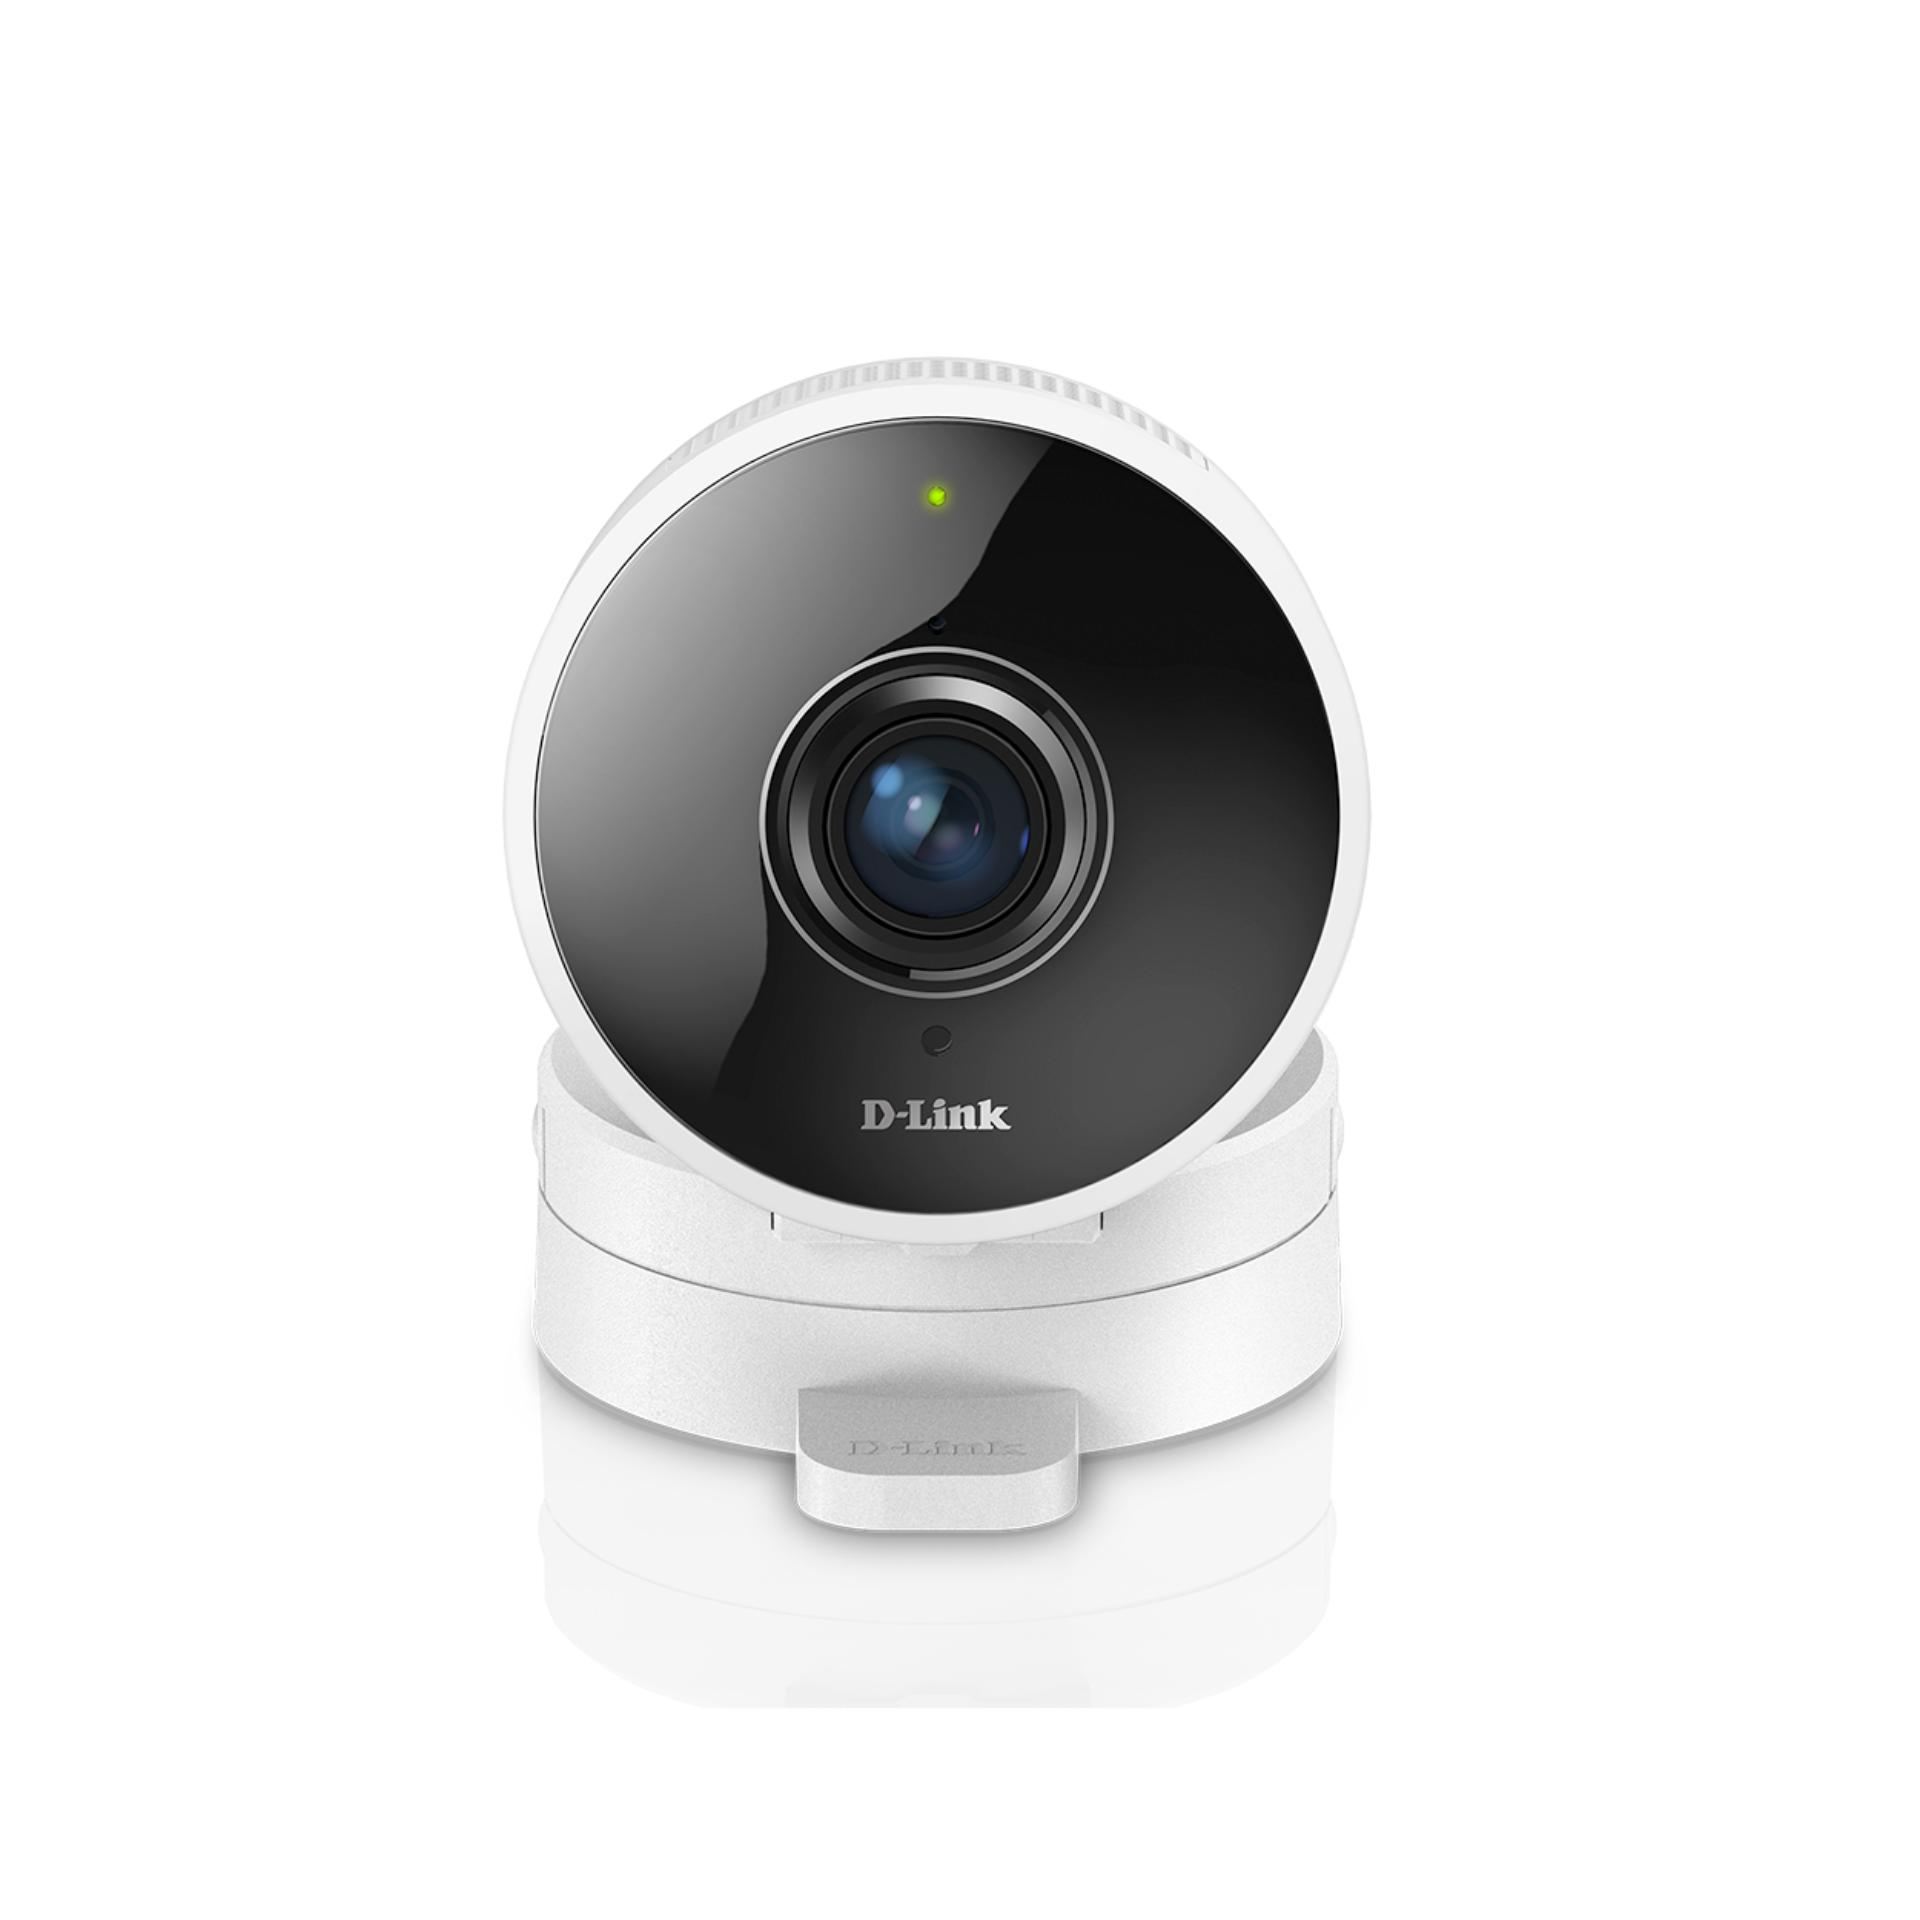 D-Link DCS-8100LH HD Wireless 180-Degree Camera